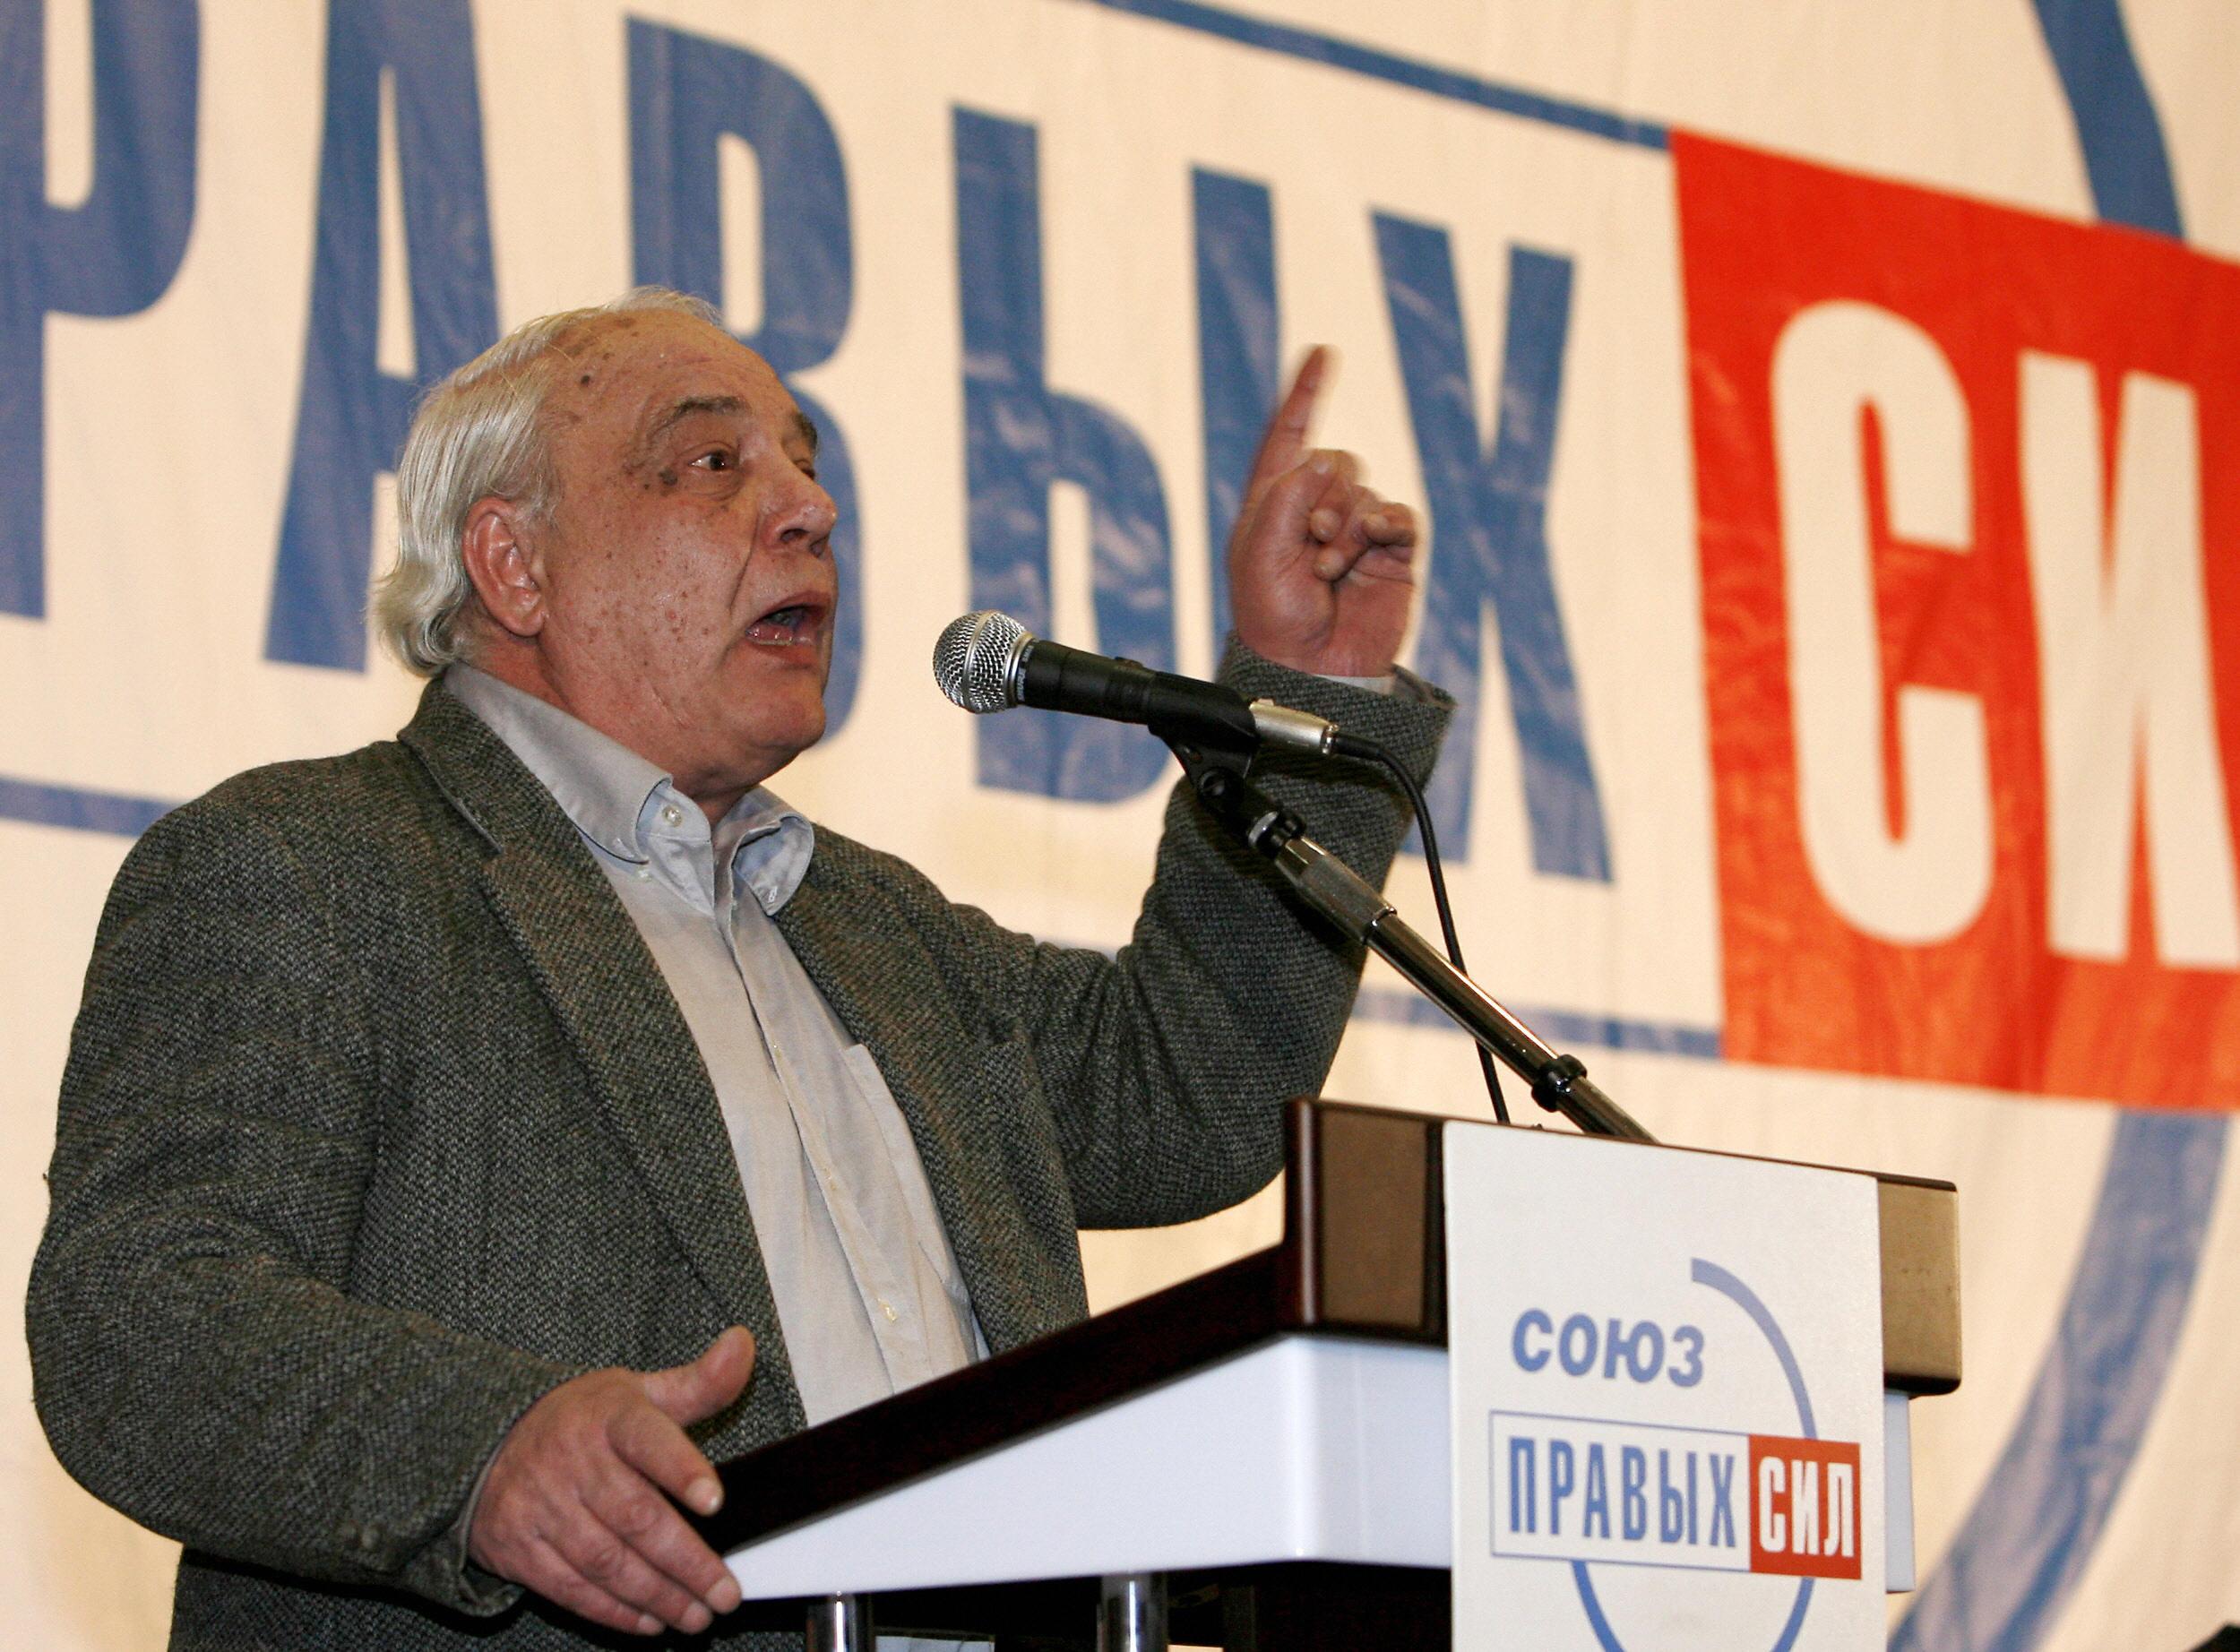 https://www.theepochtimes.com/assets/uploads/2019/01/03/Soviet-era-dissident-Vladimir-Bukovsky.jpg